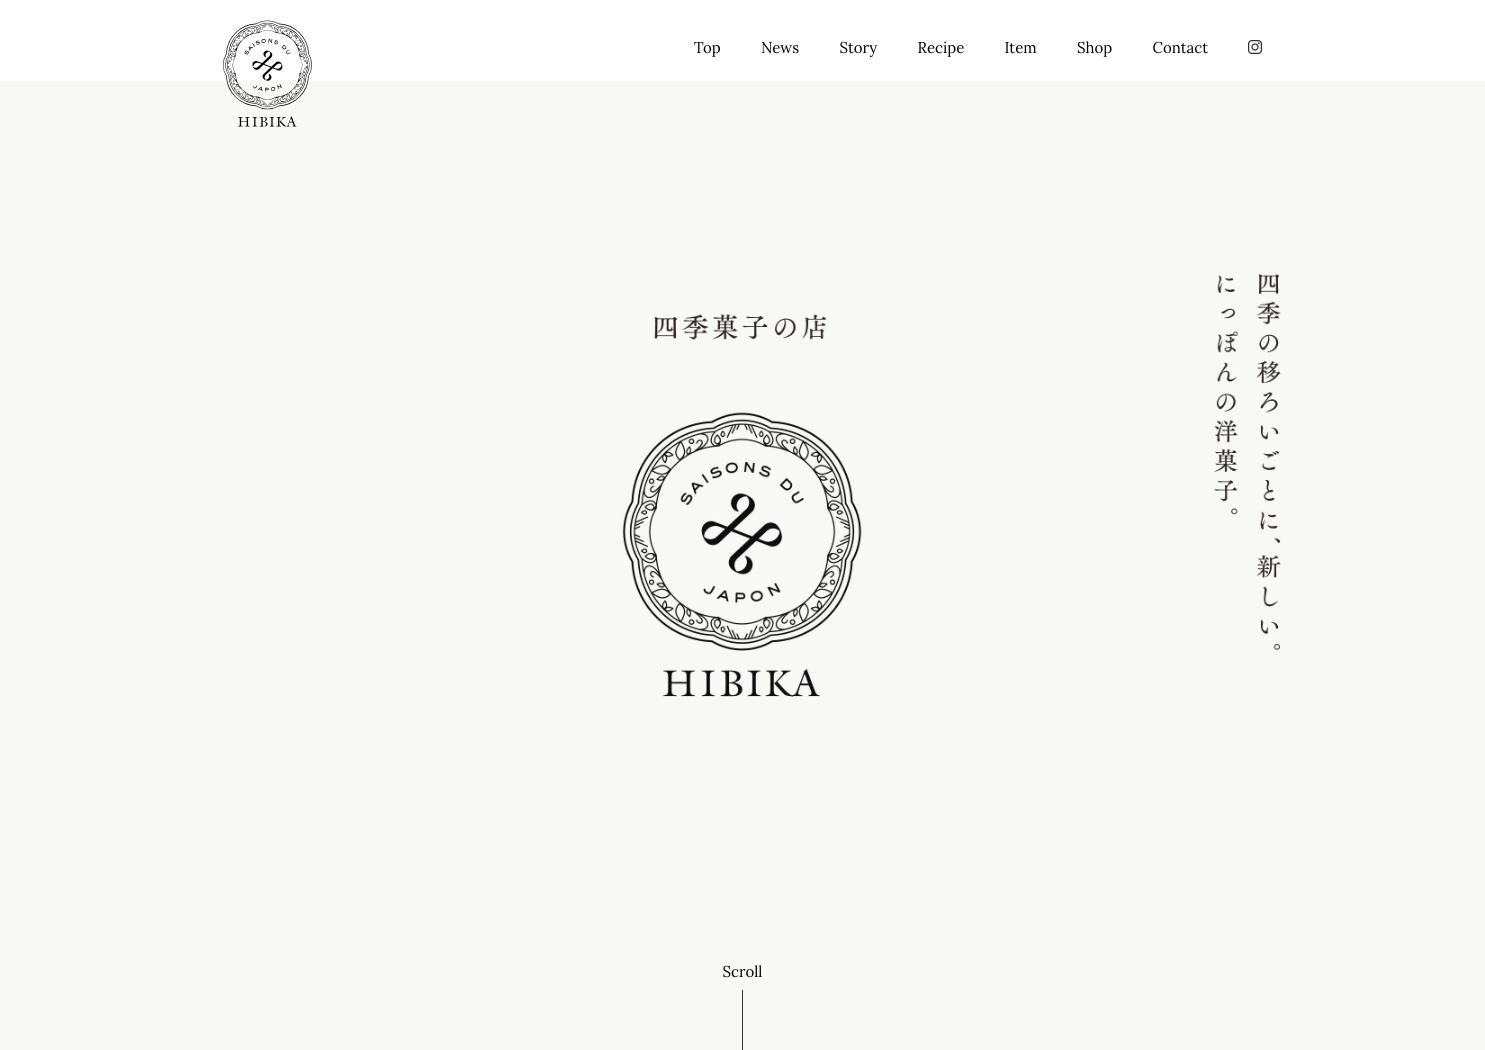 HIBIKA Official Website 2017